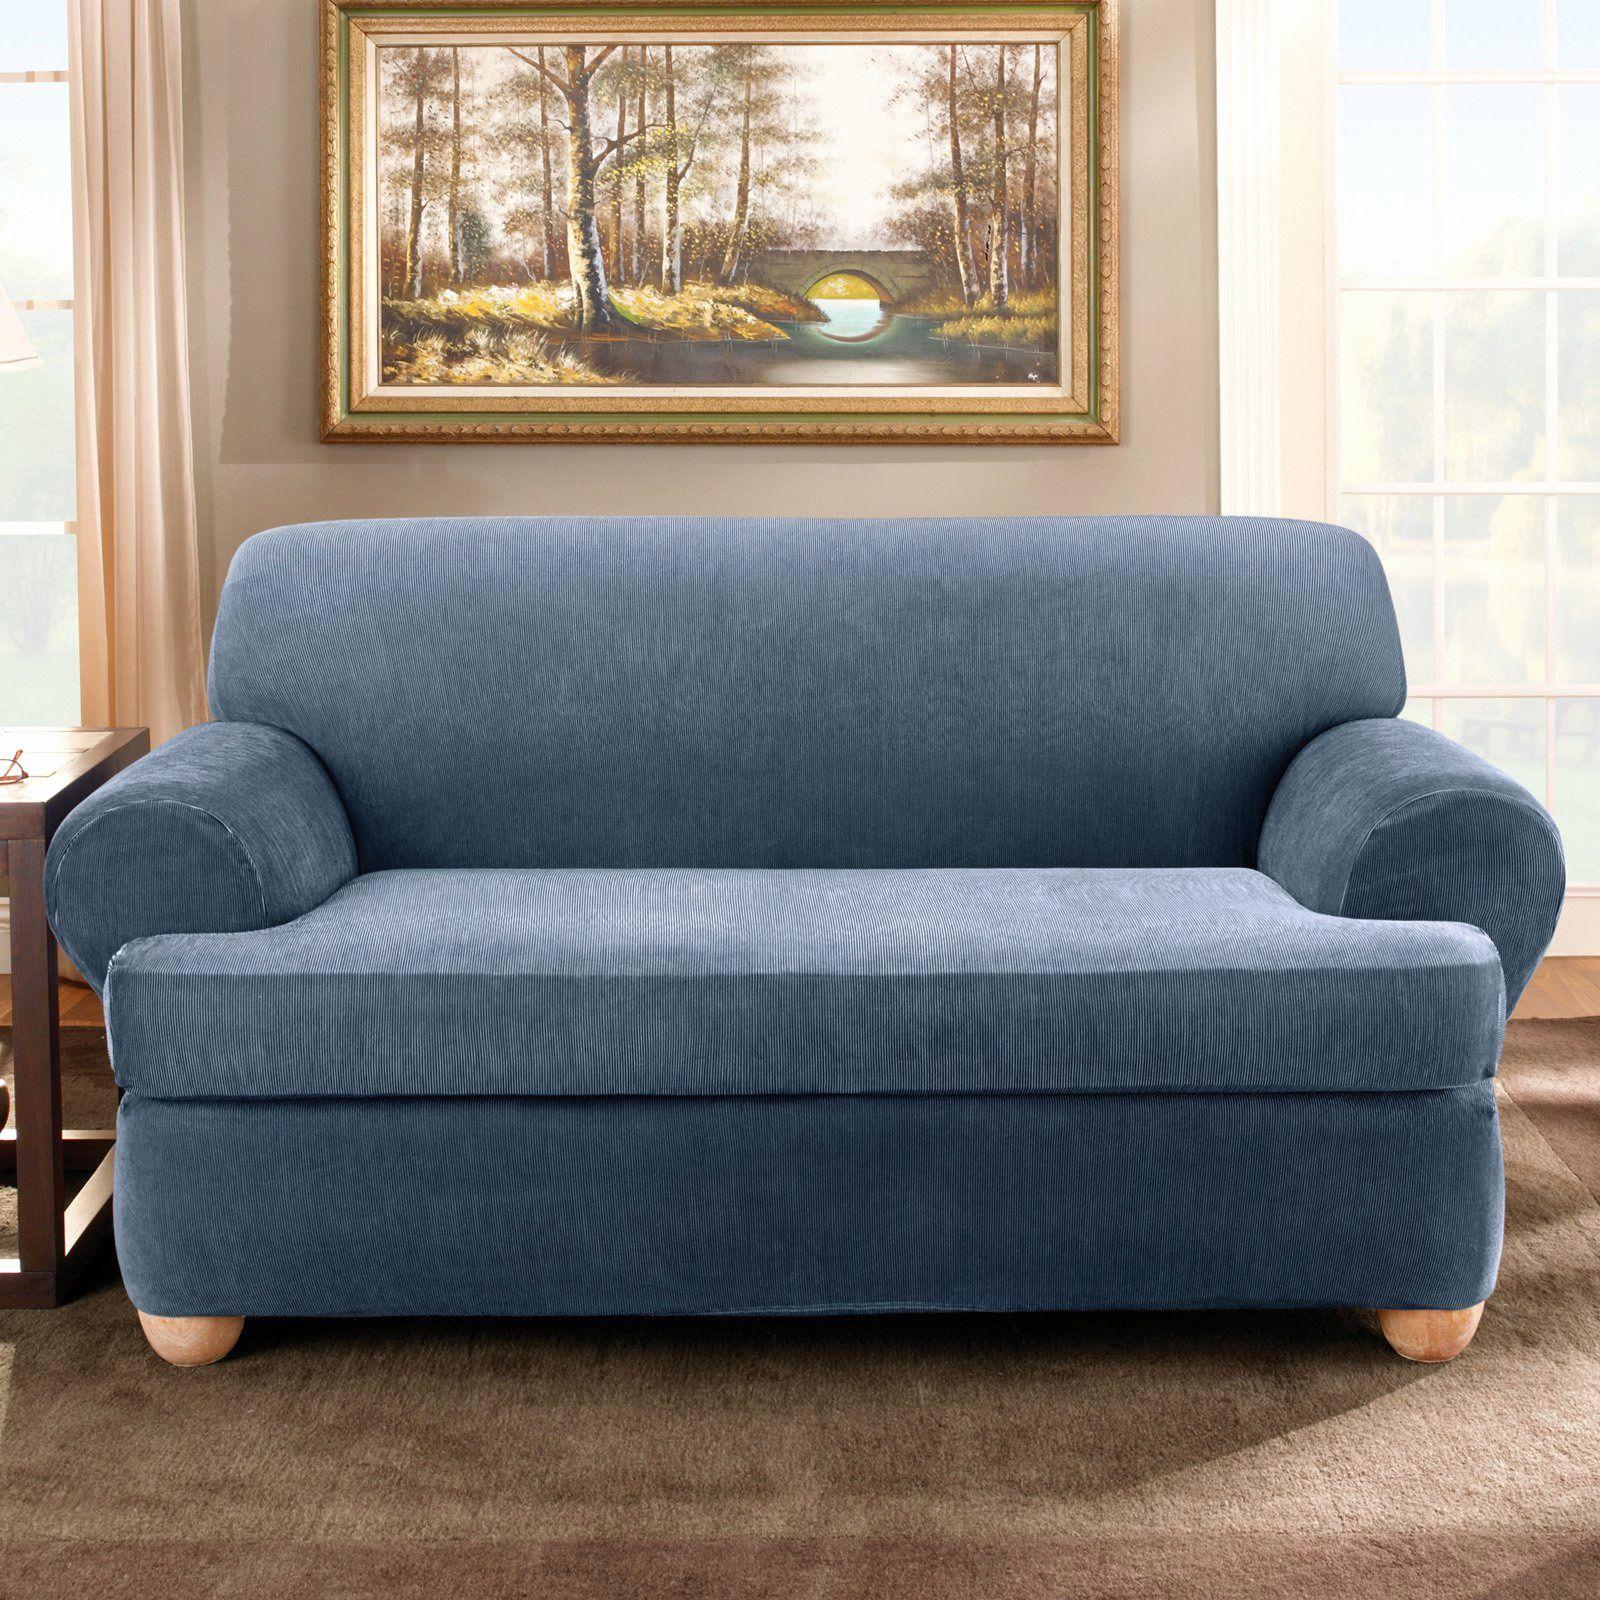 New T Shaped Sofa Covers Art T Shaped Sofa Covers Elegant Sure Fit